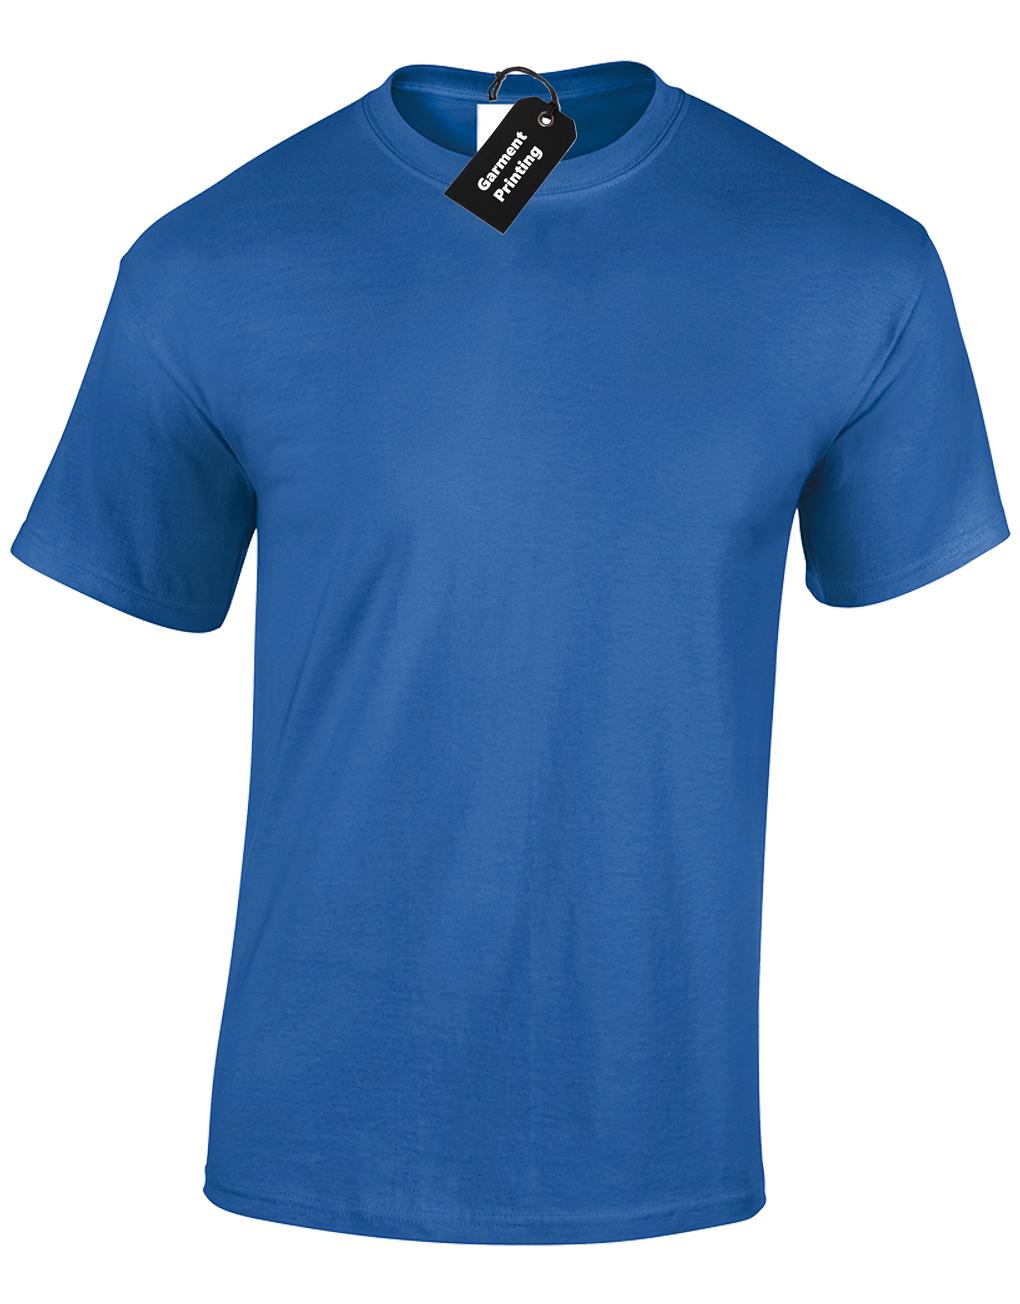 Mens Personalised Printed T-Shirt Unisex Custom Design Logo Uniform Stag Do Fun 8